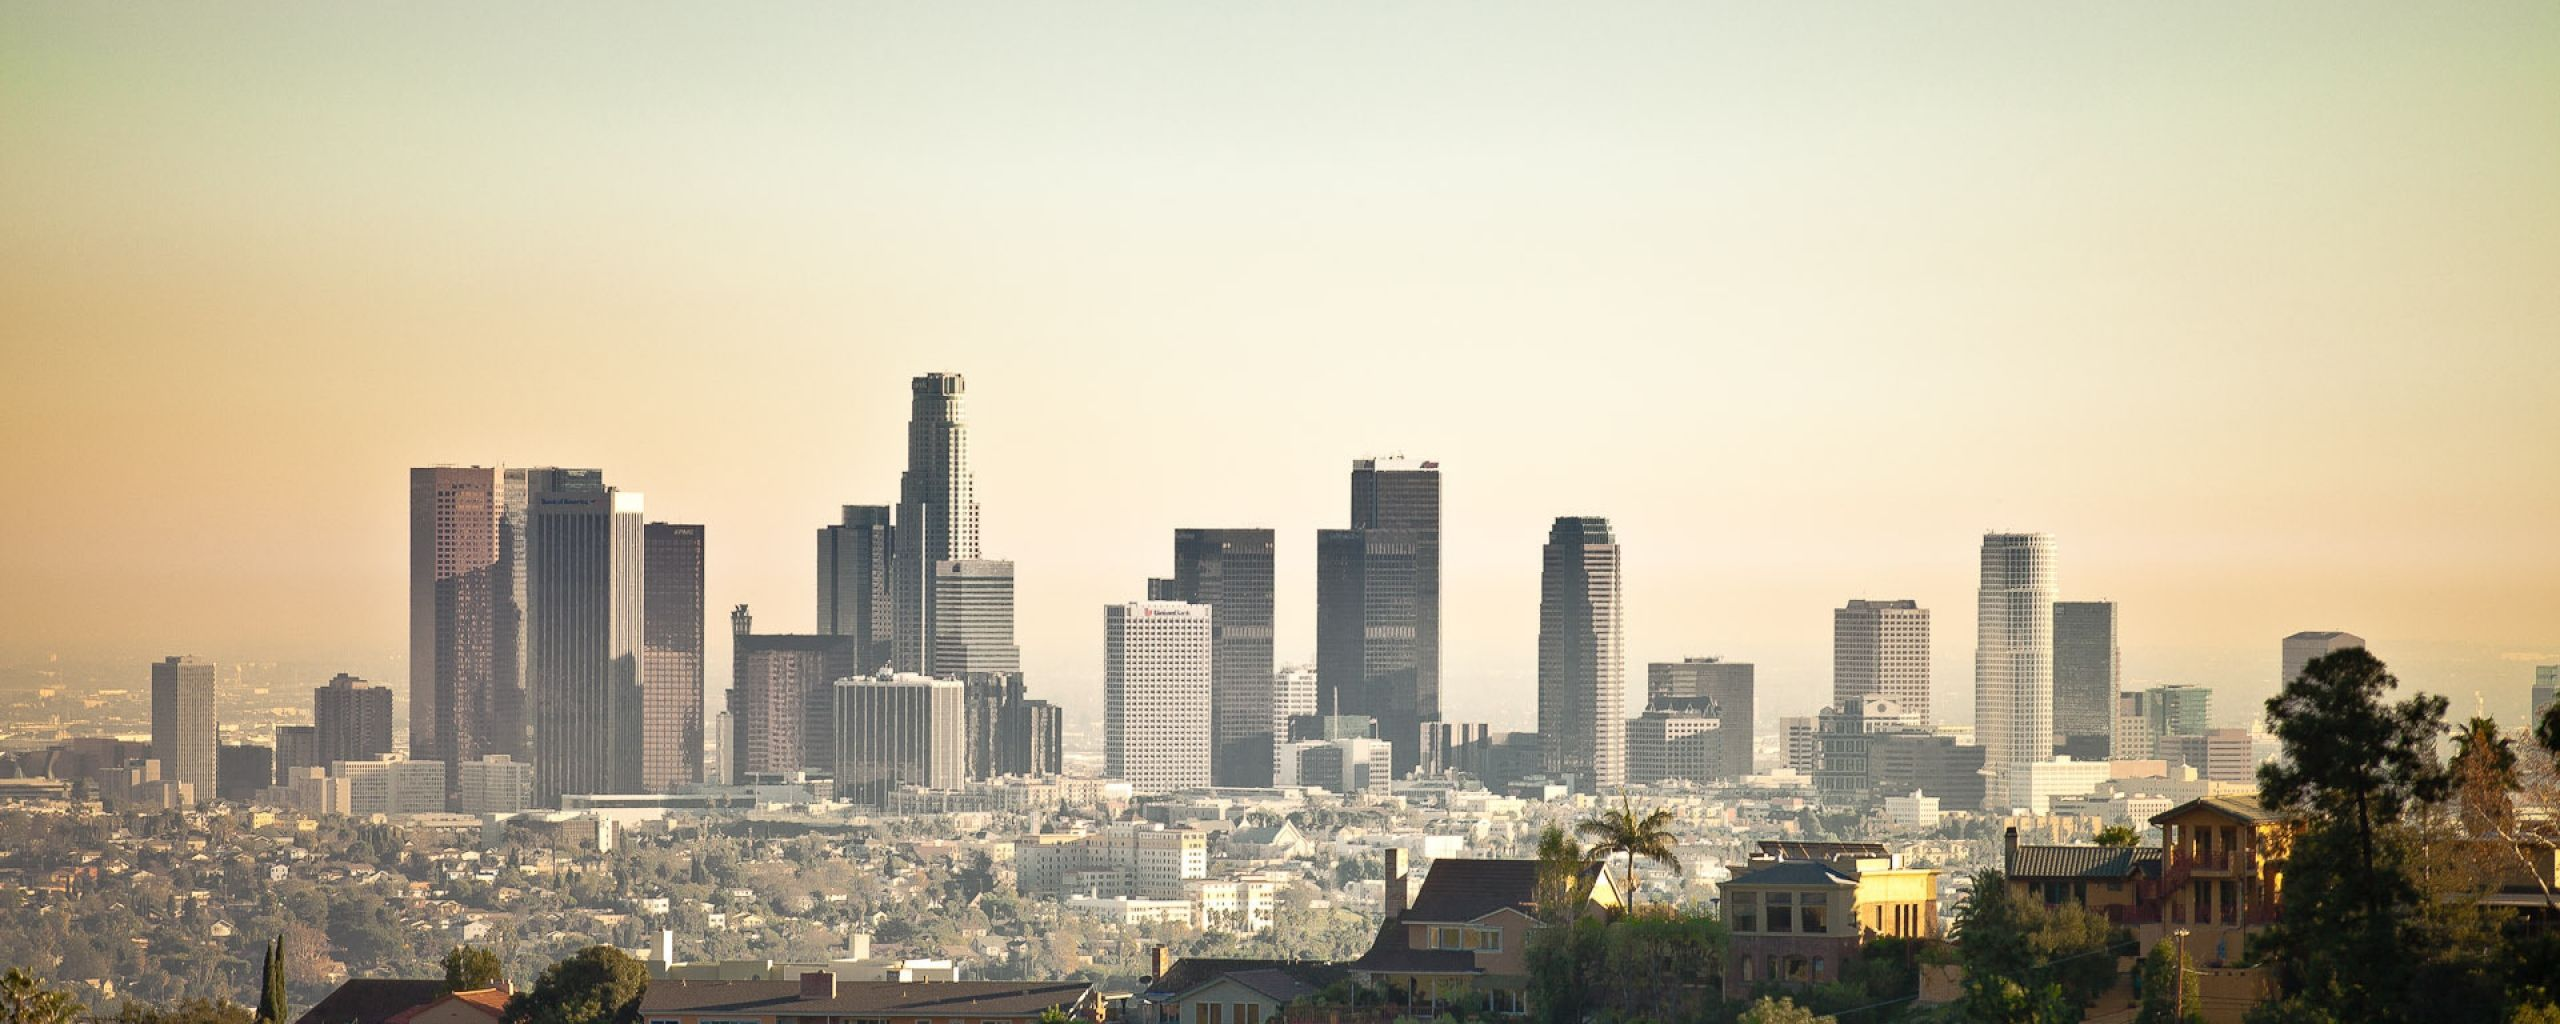 Download Wallpaper 2560x1024 Los Angeles Laguna Beach Buildings Skyscrapers Dual Monitor Resoluti Los Angeles Wallpaper Los Angeles Skyline Los Angeles City